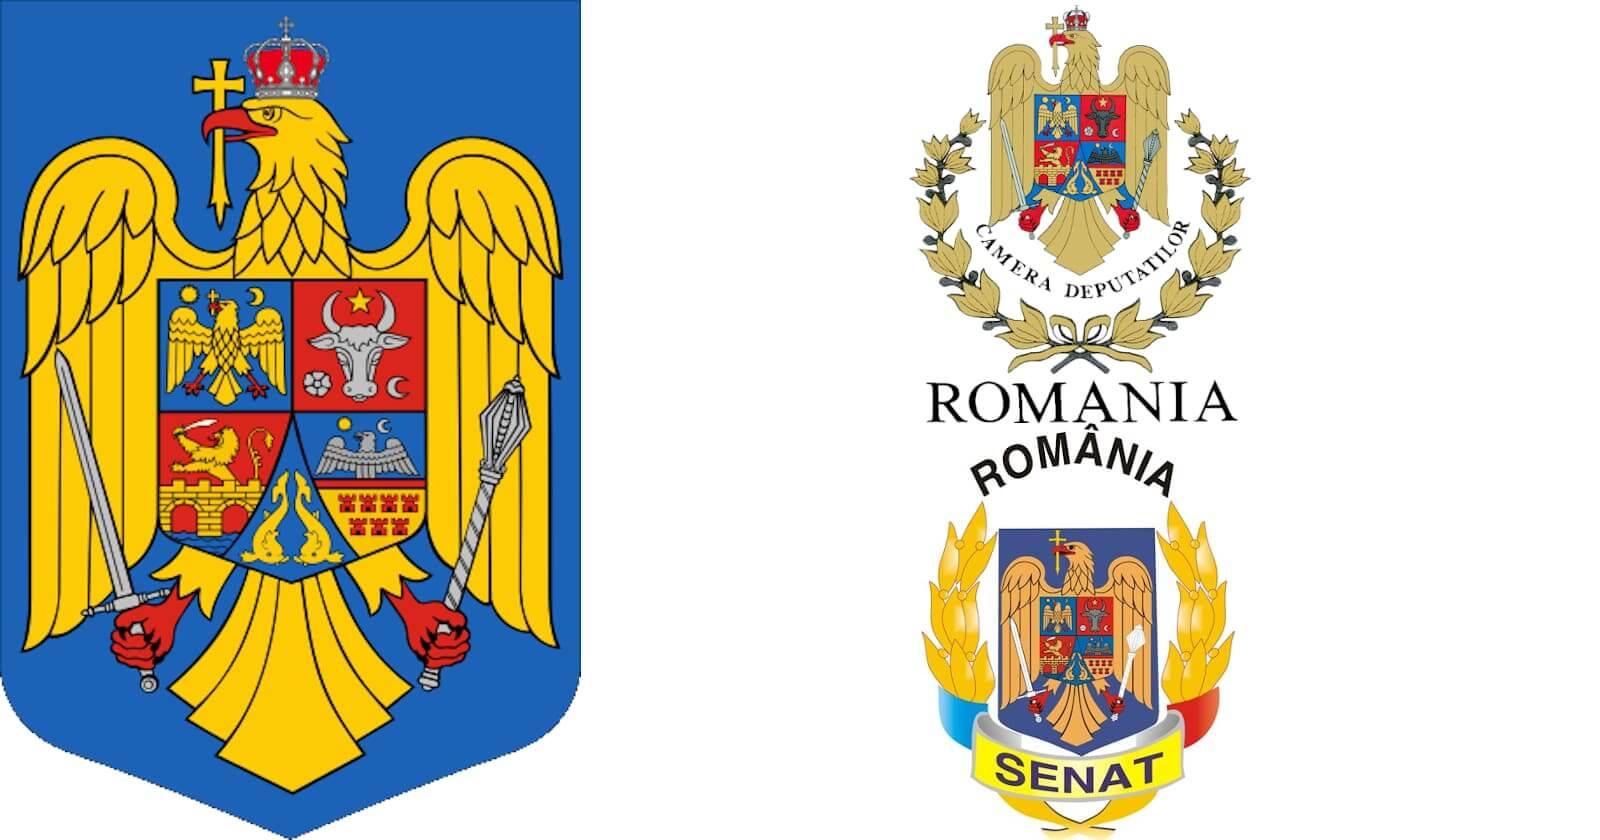 https://ziarul.romania-rationala.ro/control/articole/articole/parlamentul-romaniei-banner_4.jpg